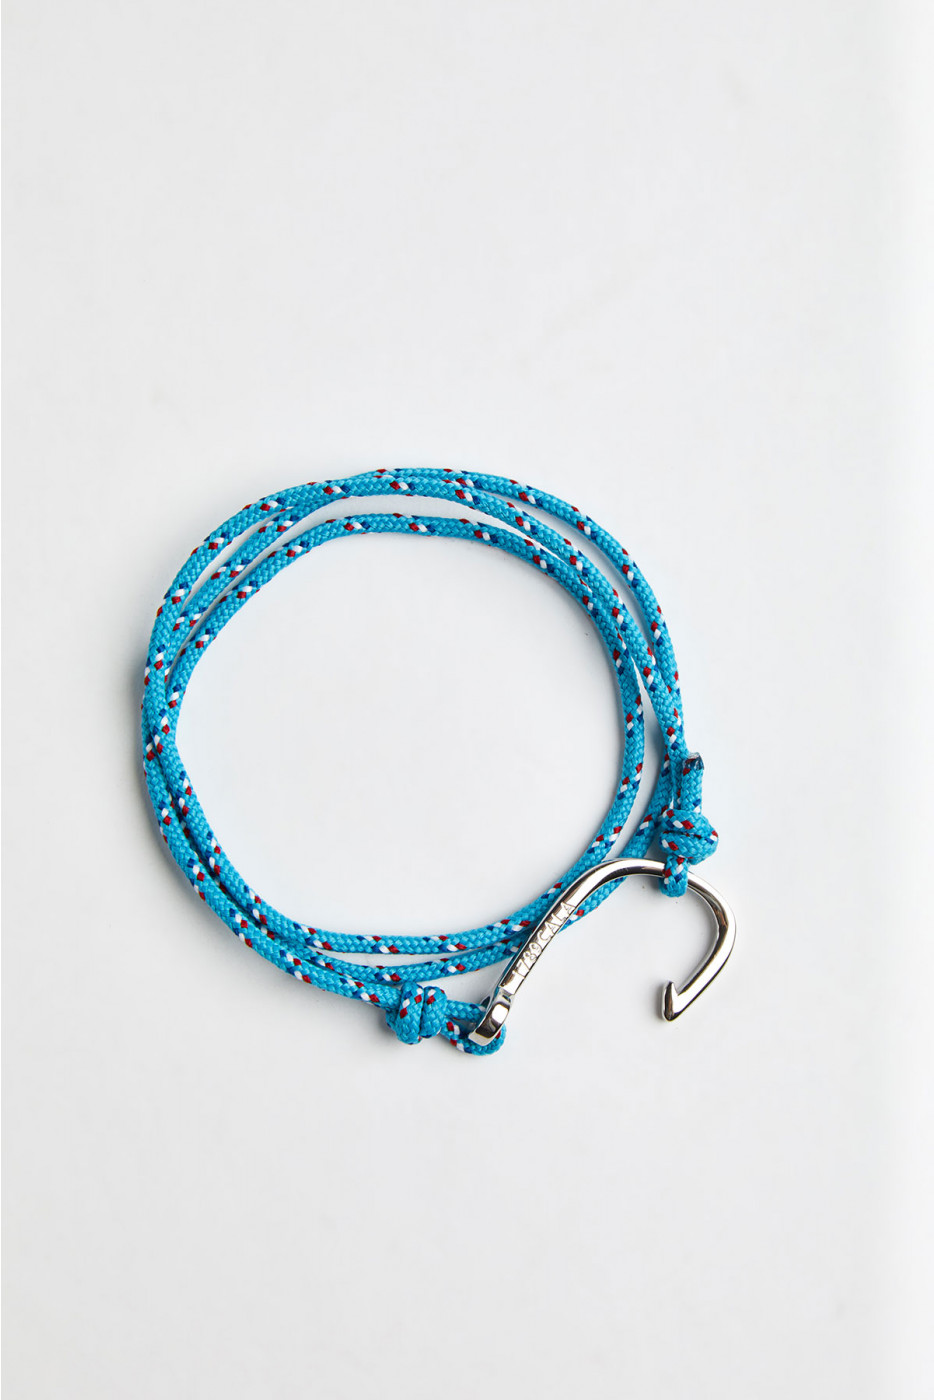 Bracelet Corde Turquoise - HAMEÇON BRACELET